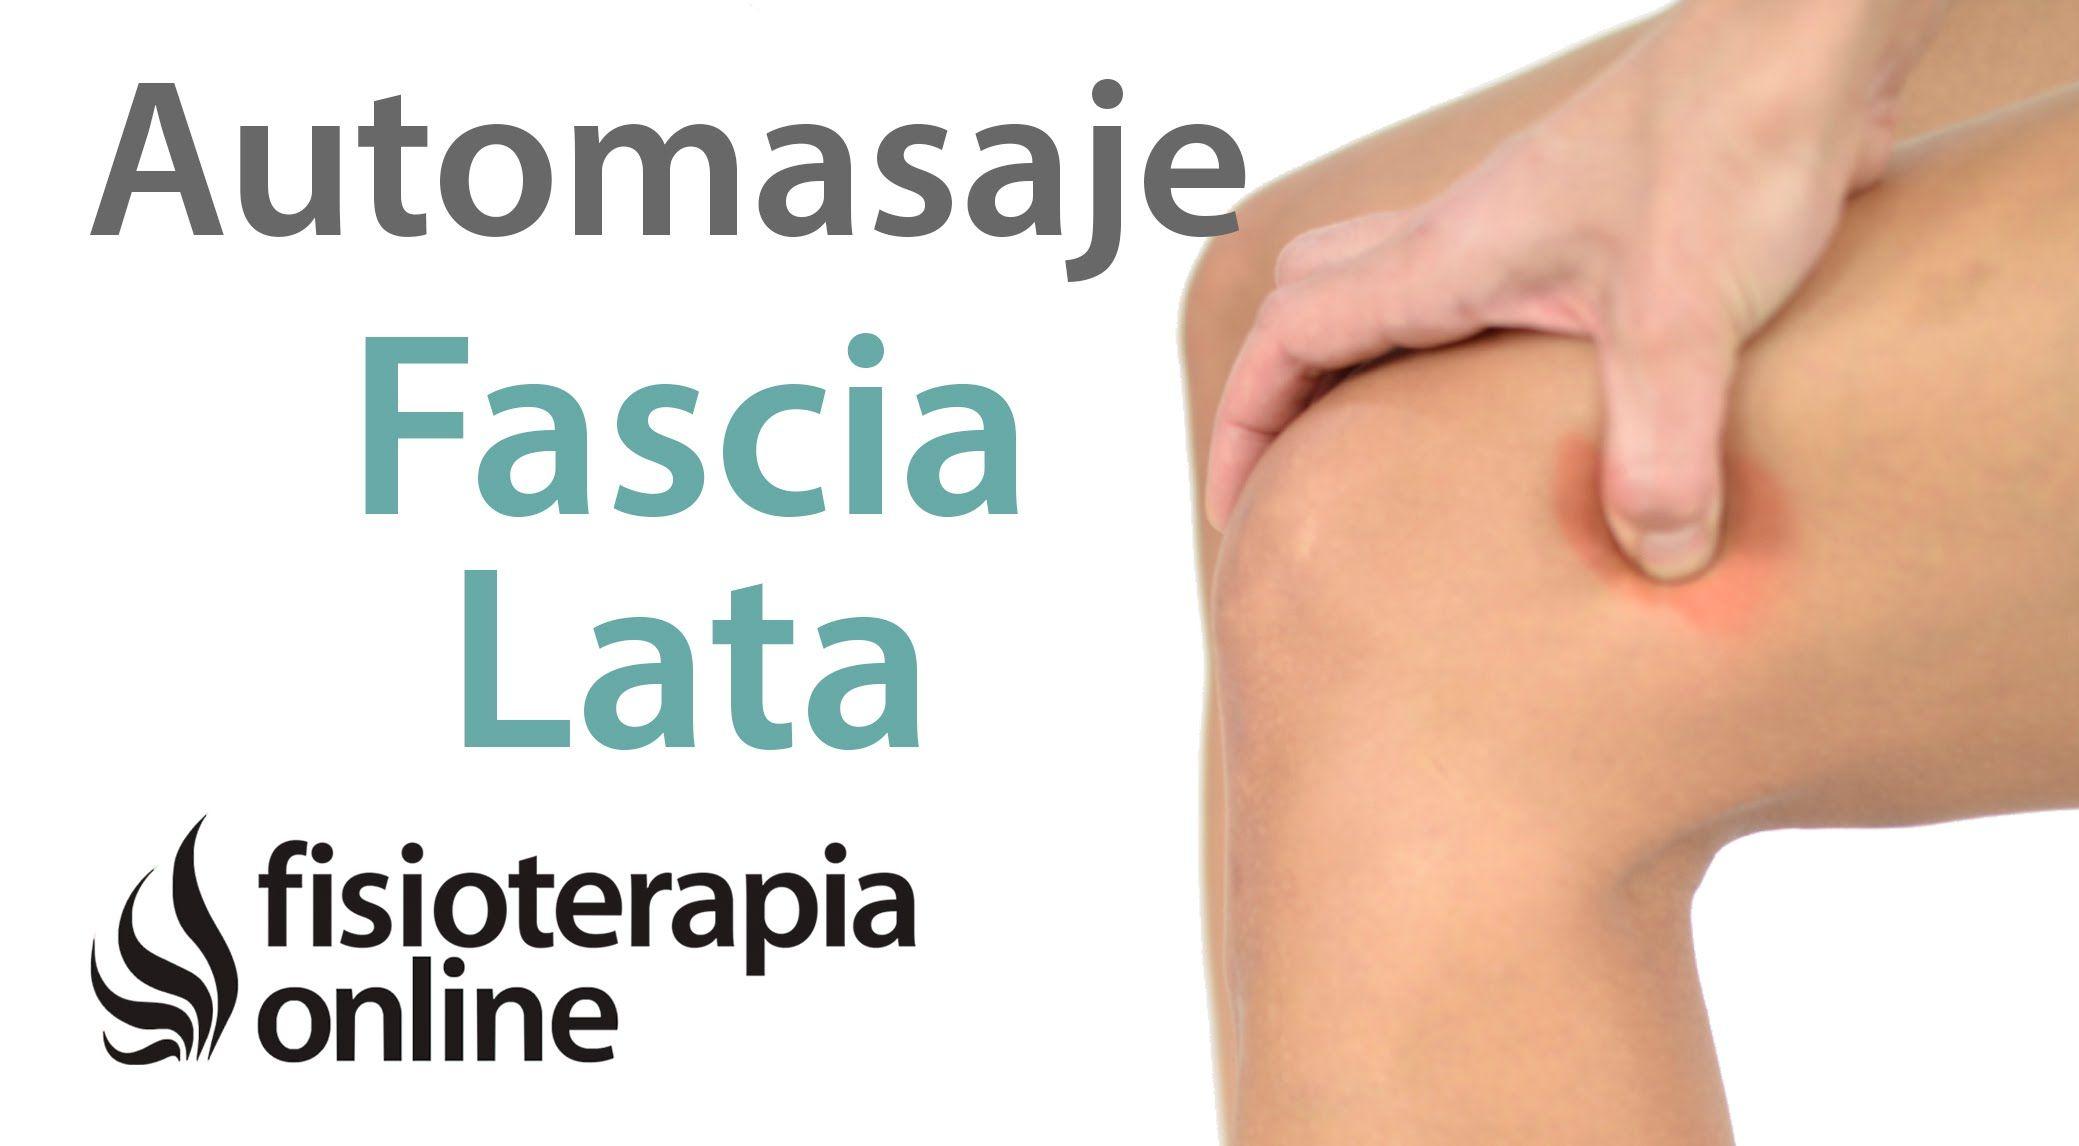 Tendinitis del músculo tensor de la fascia lata. Auto-Masaje para su tra...